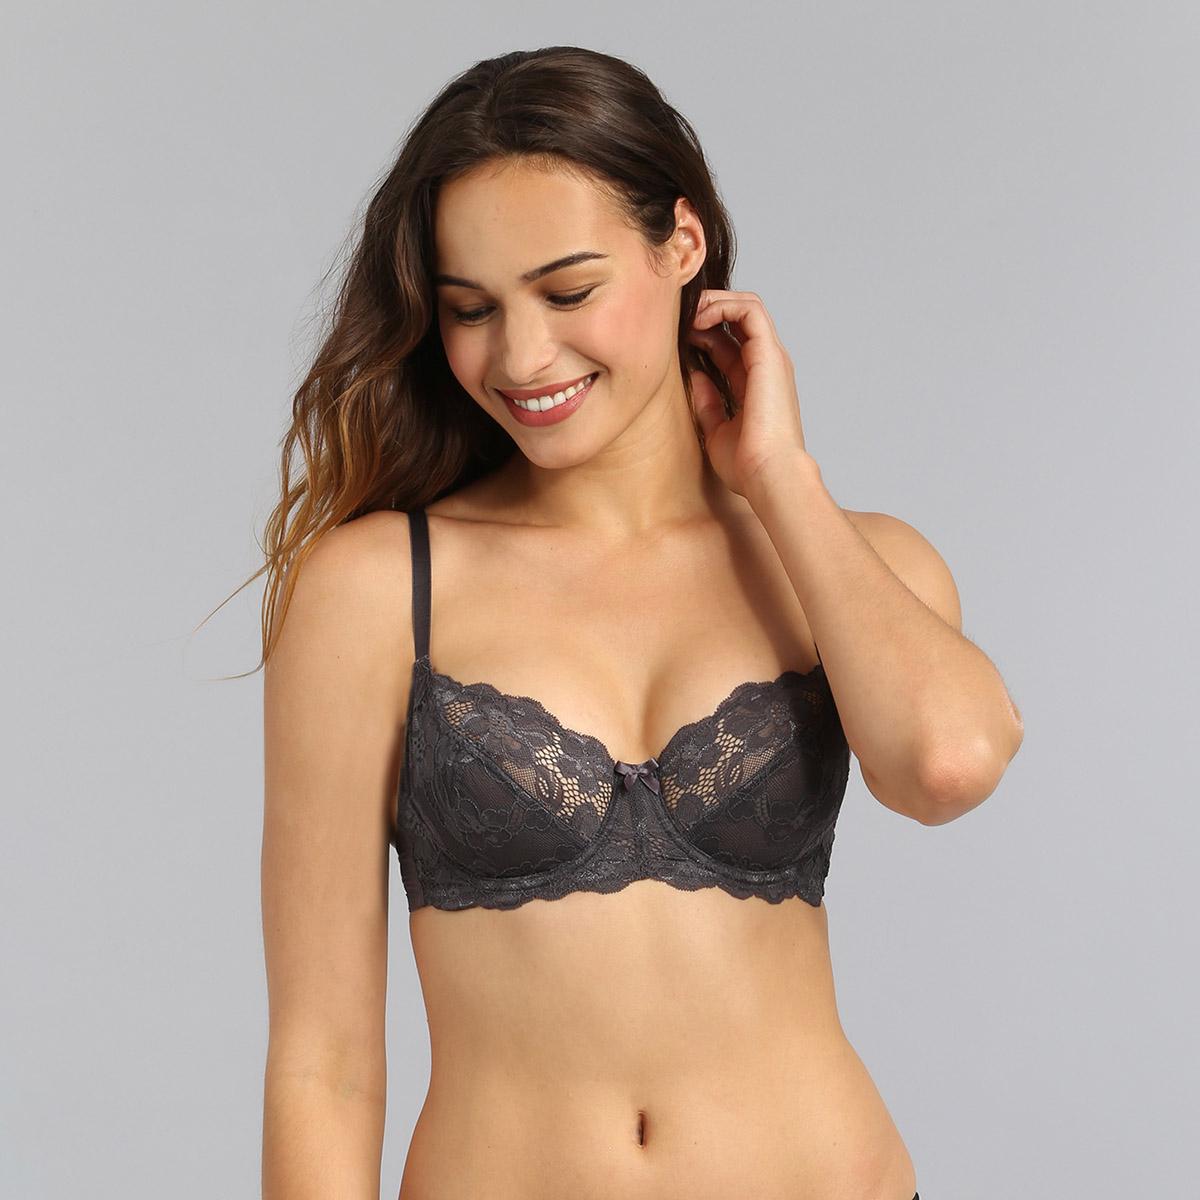 Underwired bra in steel grey Essential Elegance, , PLAYTEX